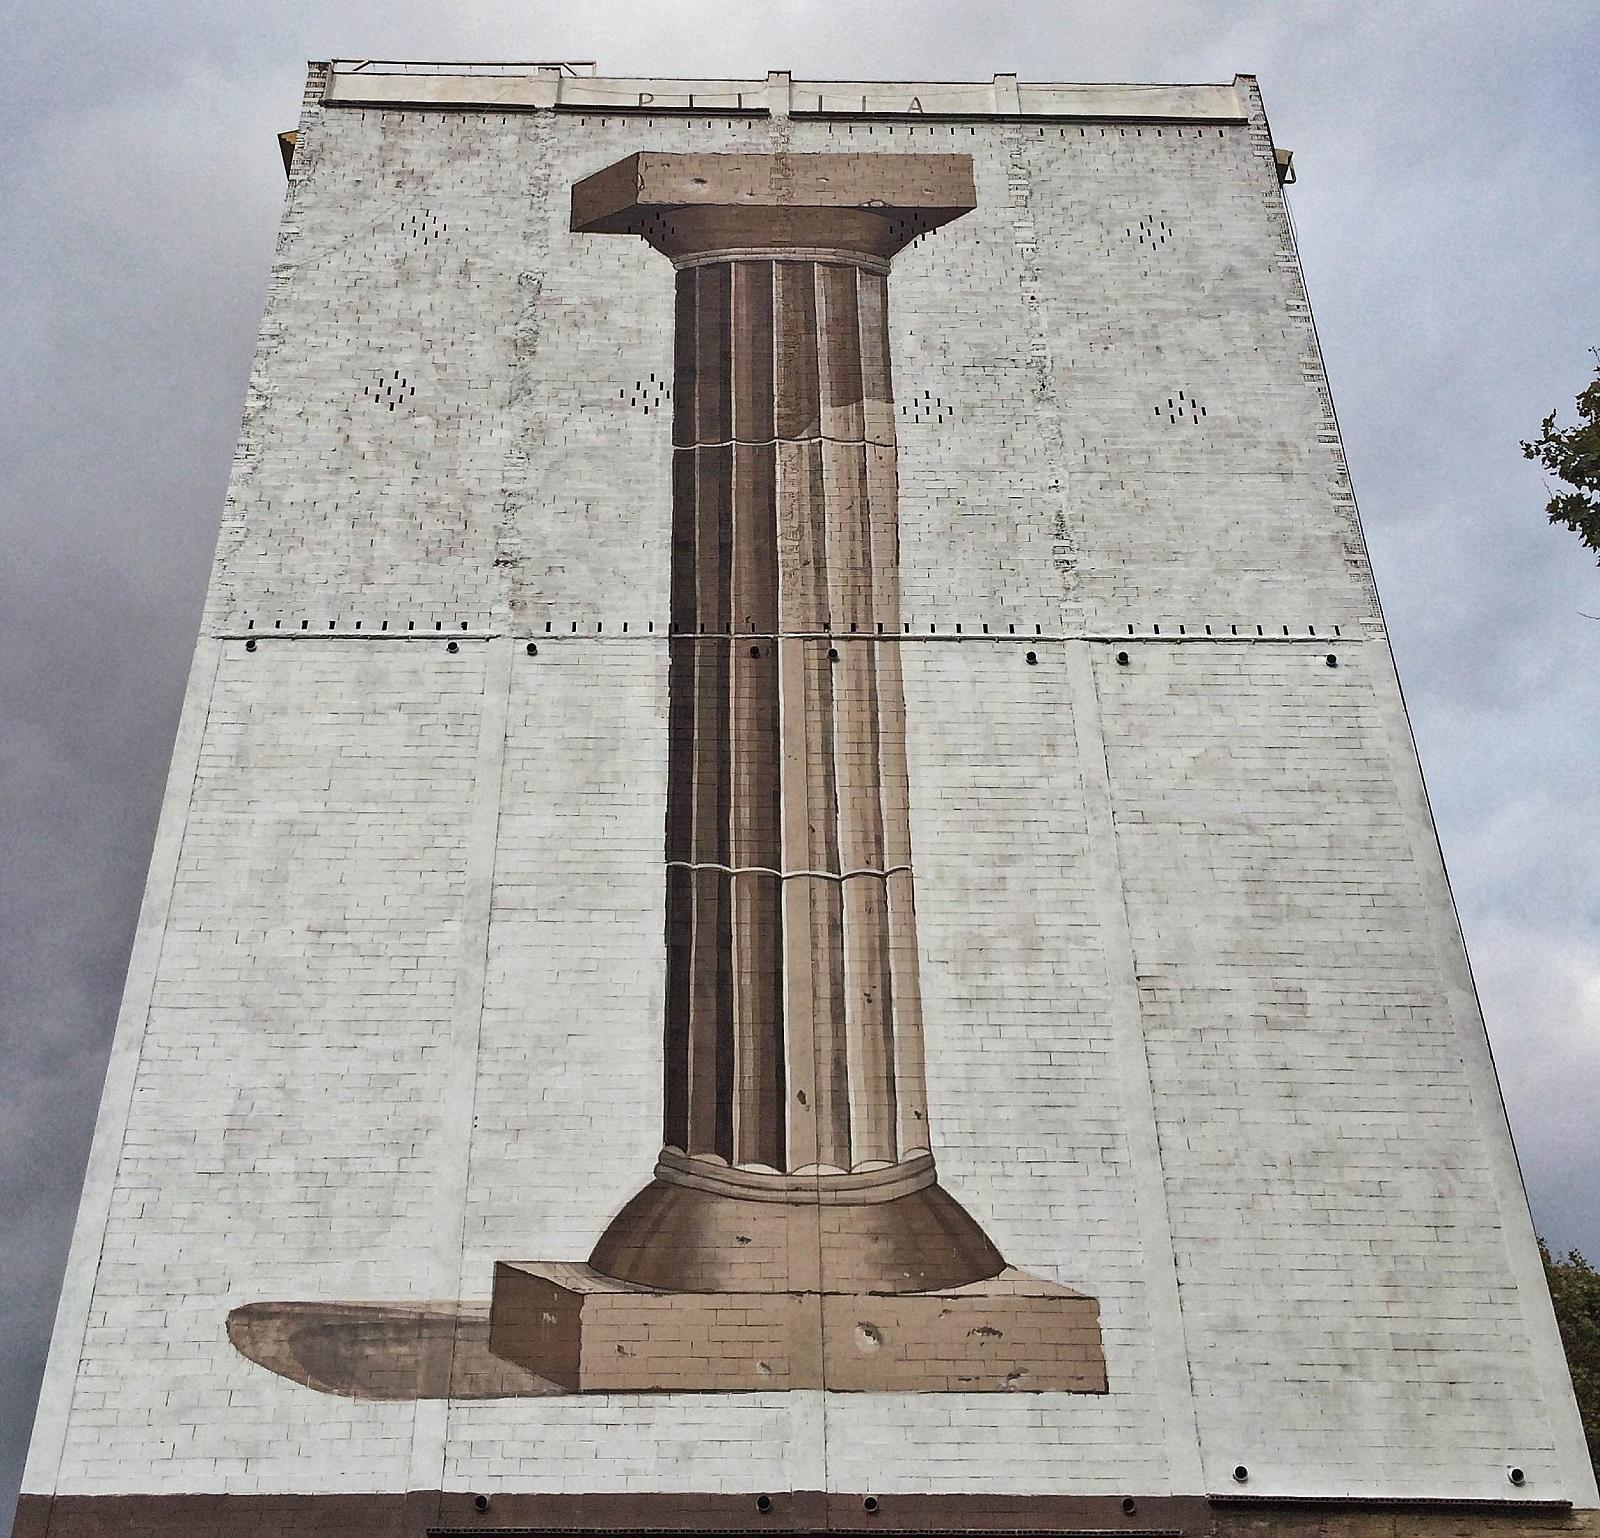 escif-new-mural-for-openwalls-barcelona-03